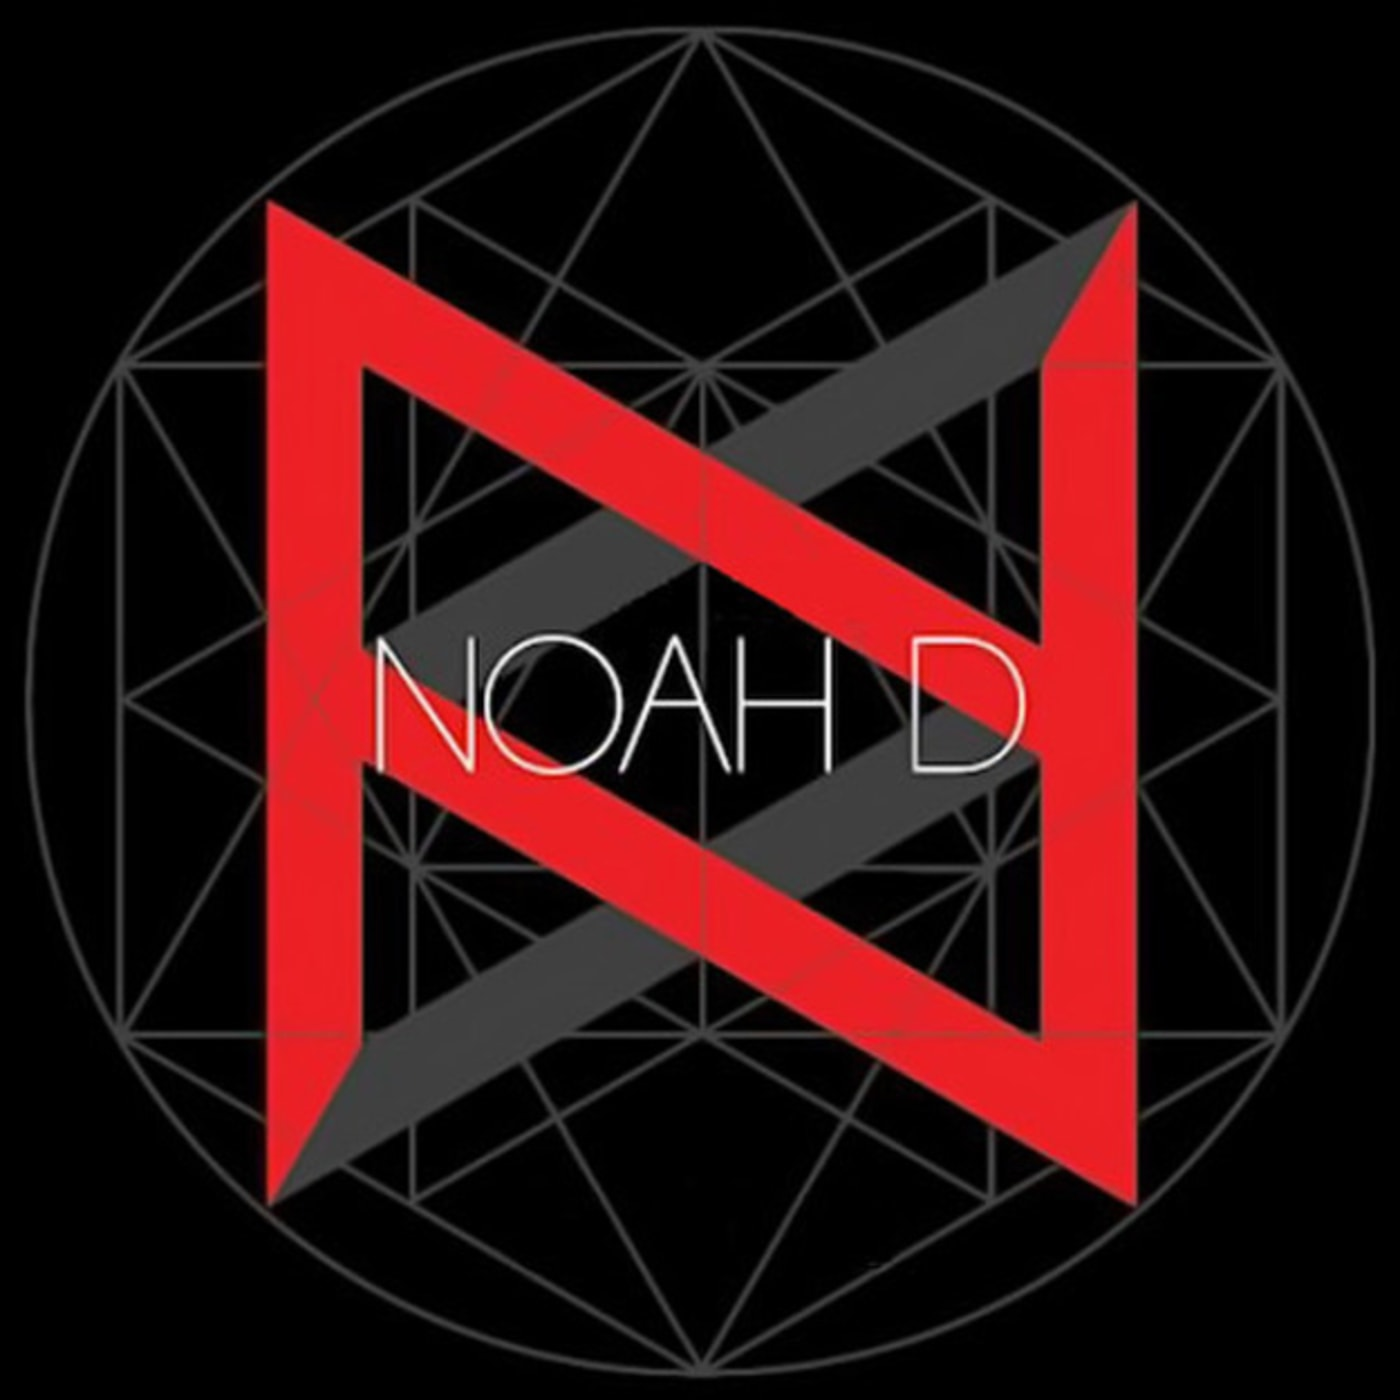 noah d logo